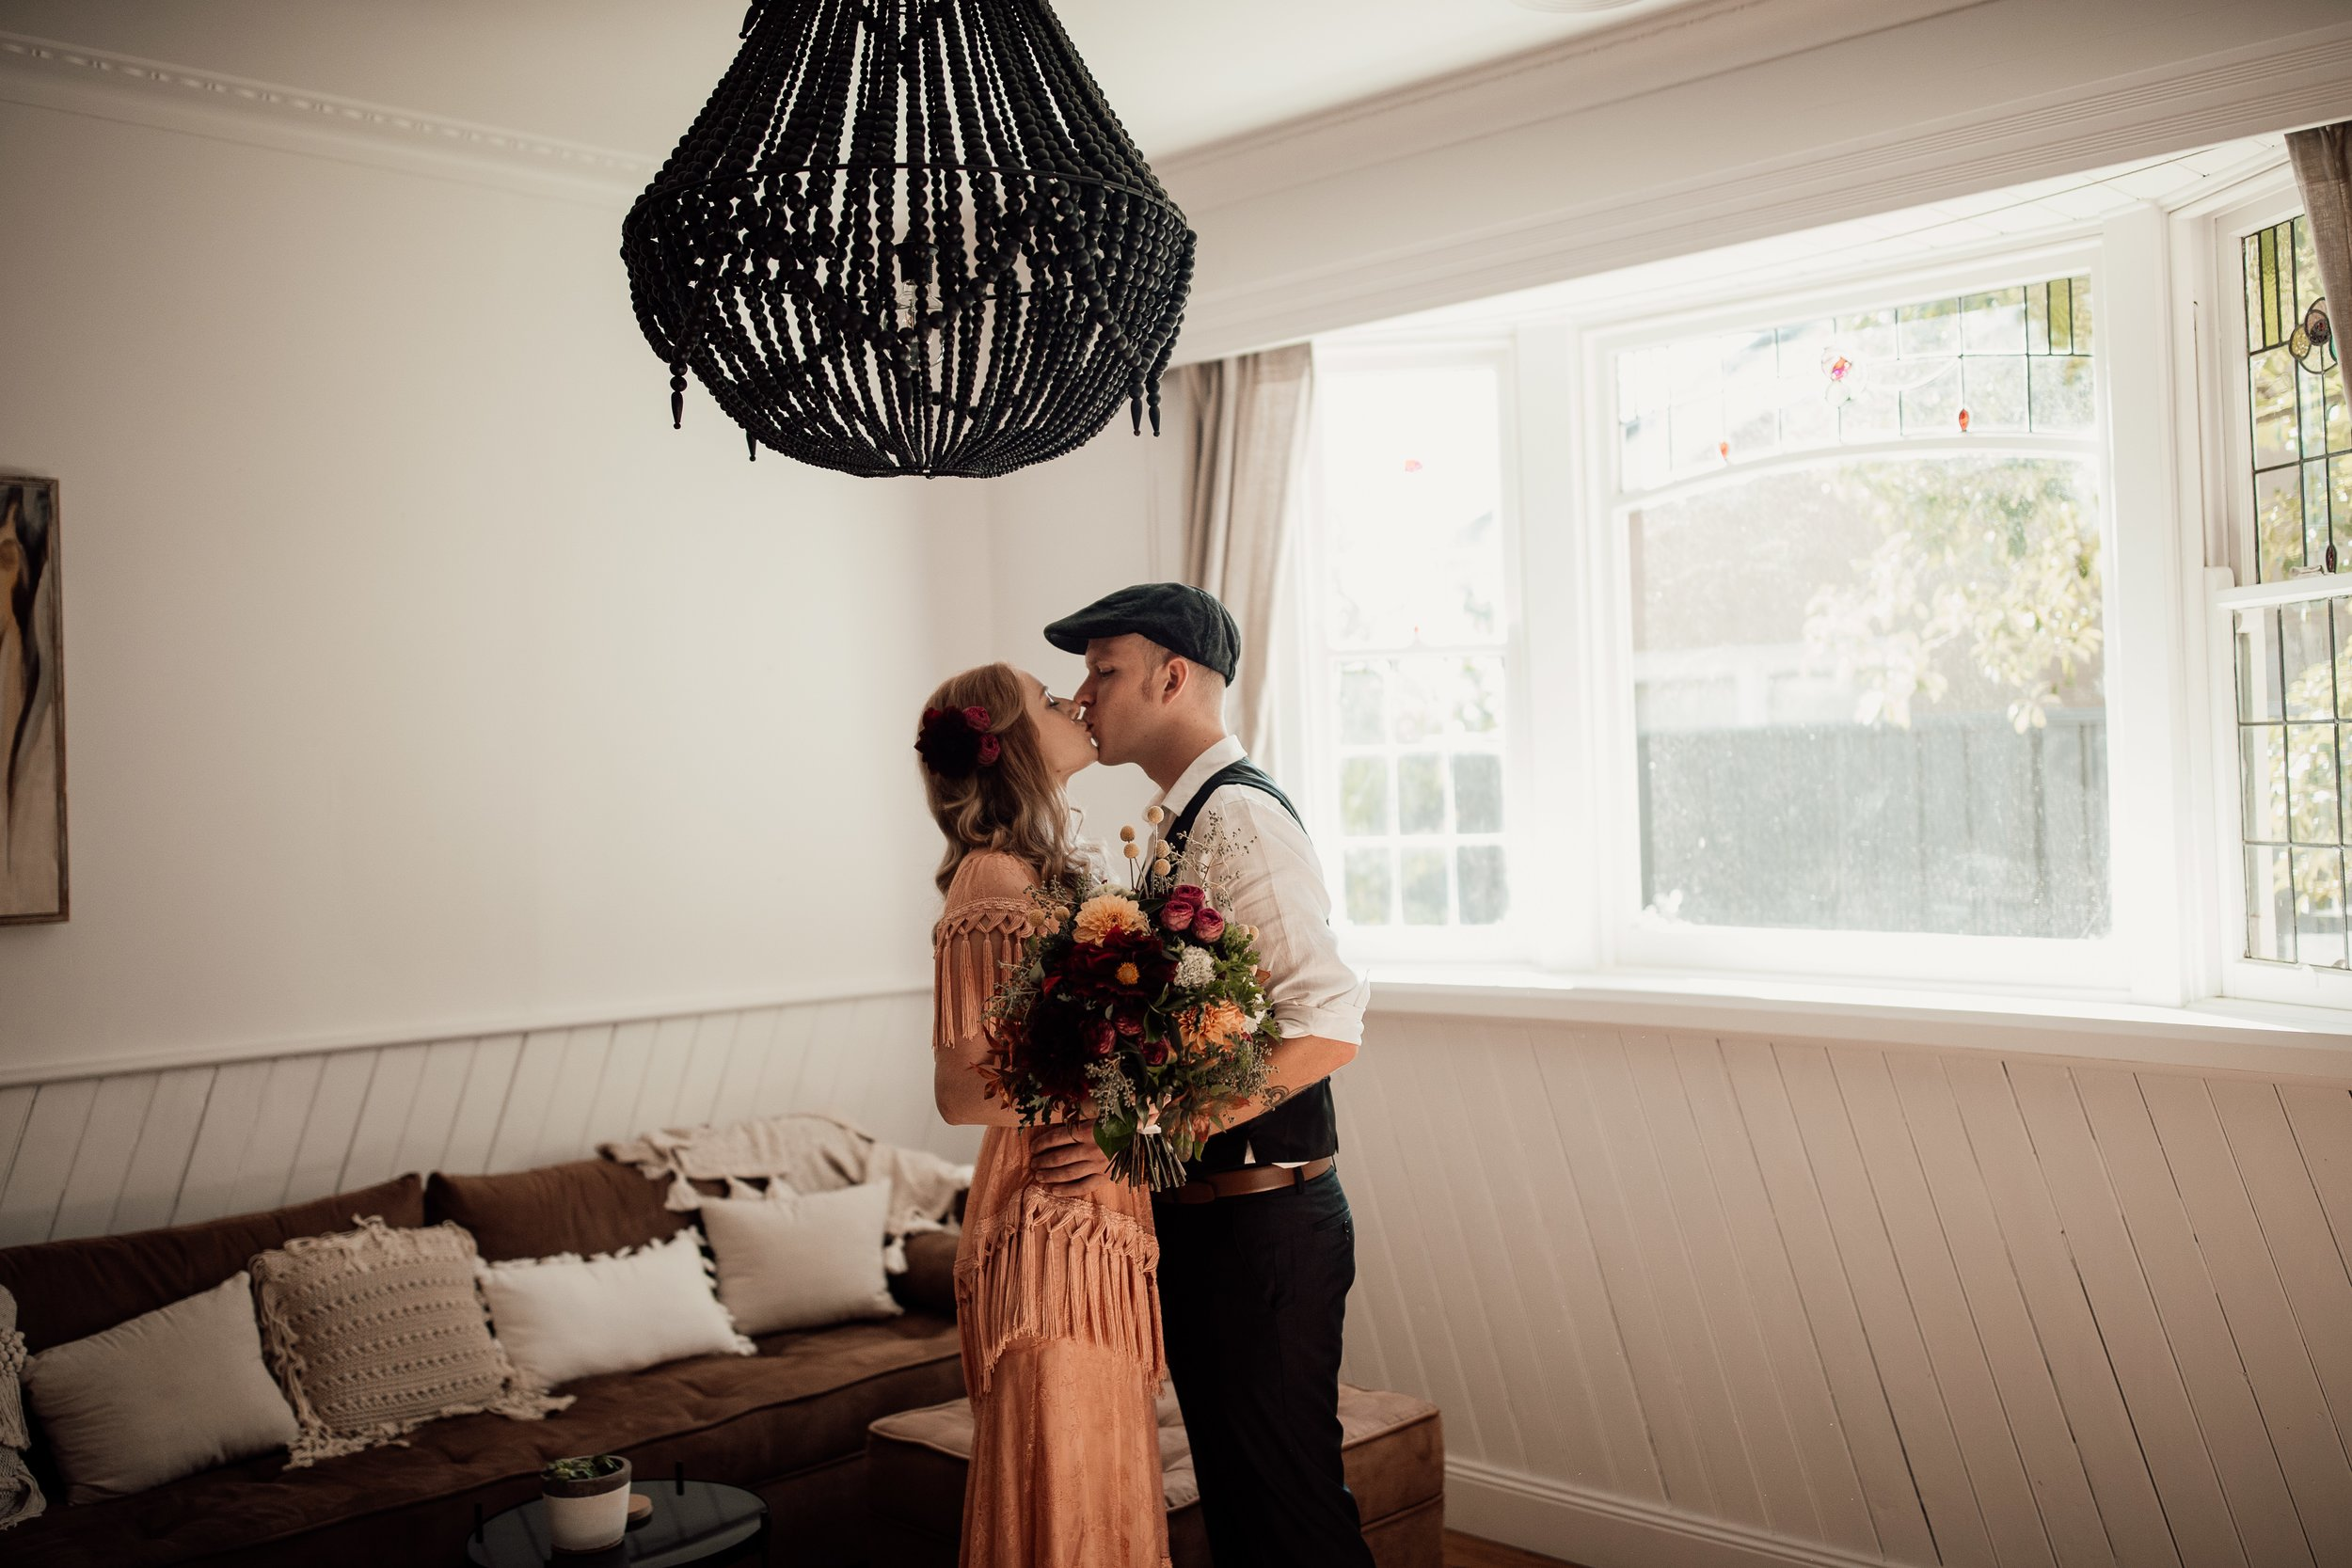 mickalathomas_puremacphotography_weddingphotographer_couplephotographer_Sheppartonphotographer_2109.jpg